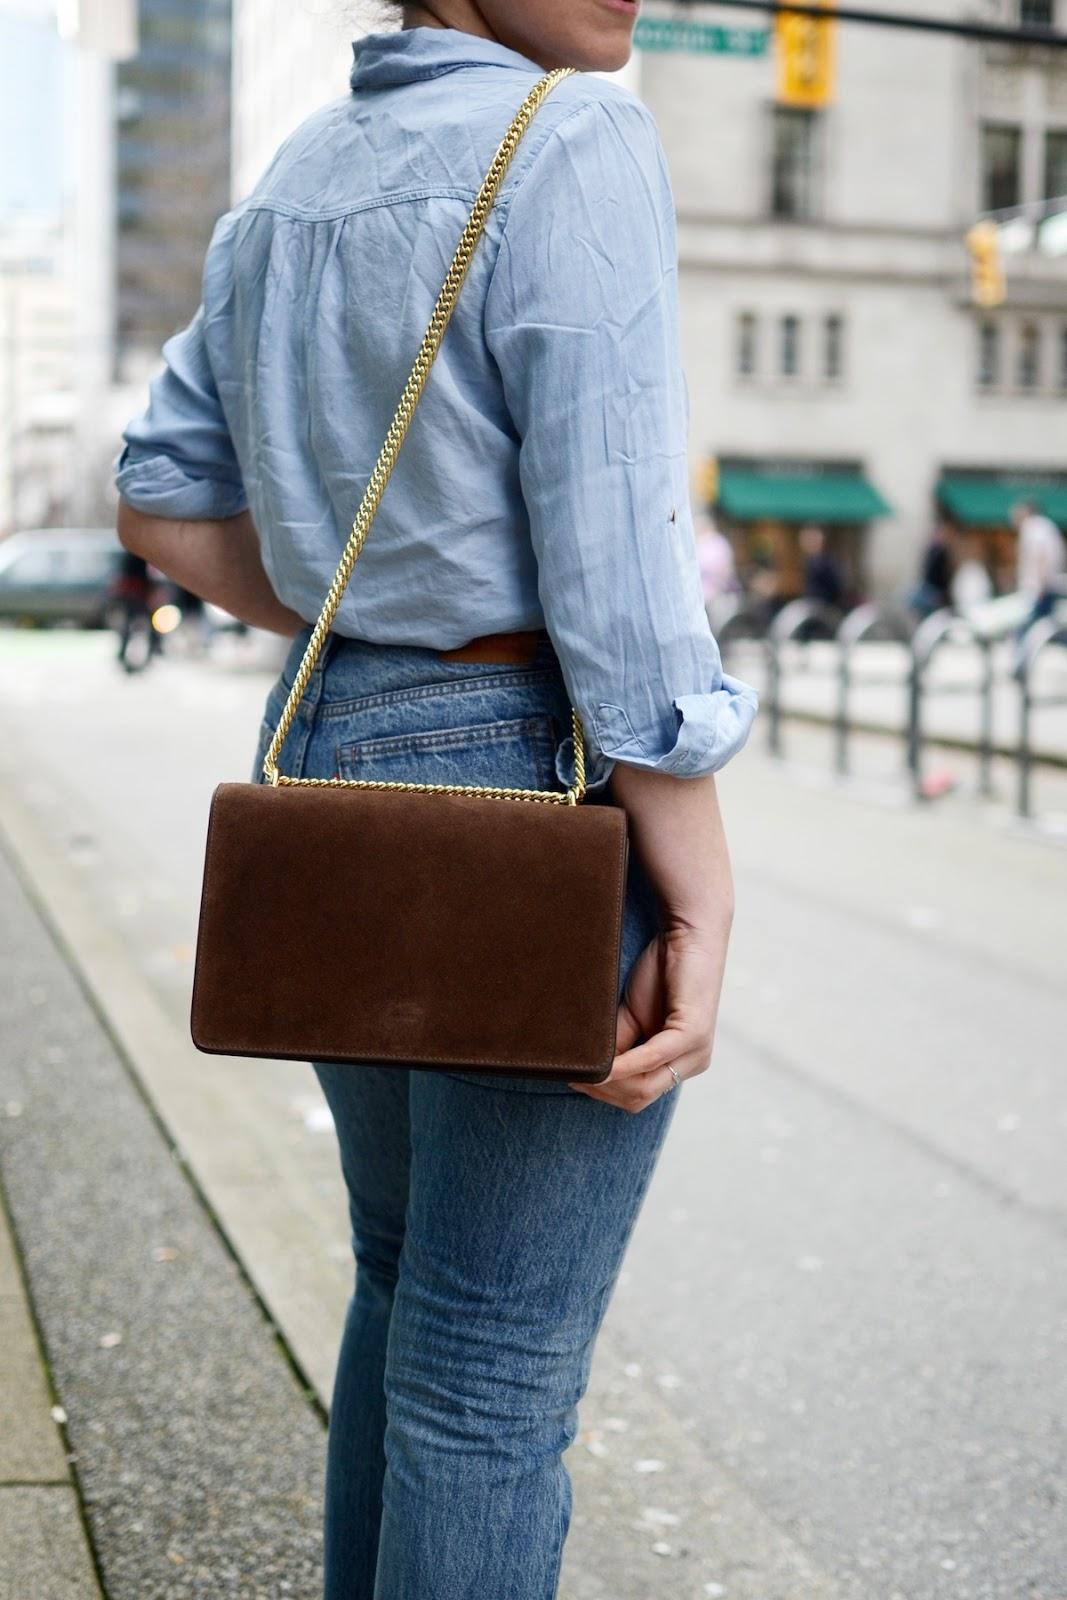 Denim outfit levis wedgie jeans AGNEEL sophie bag vancouver fashion blogger 4